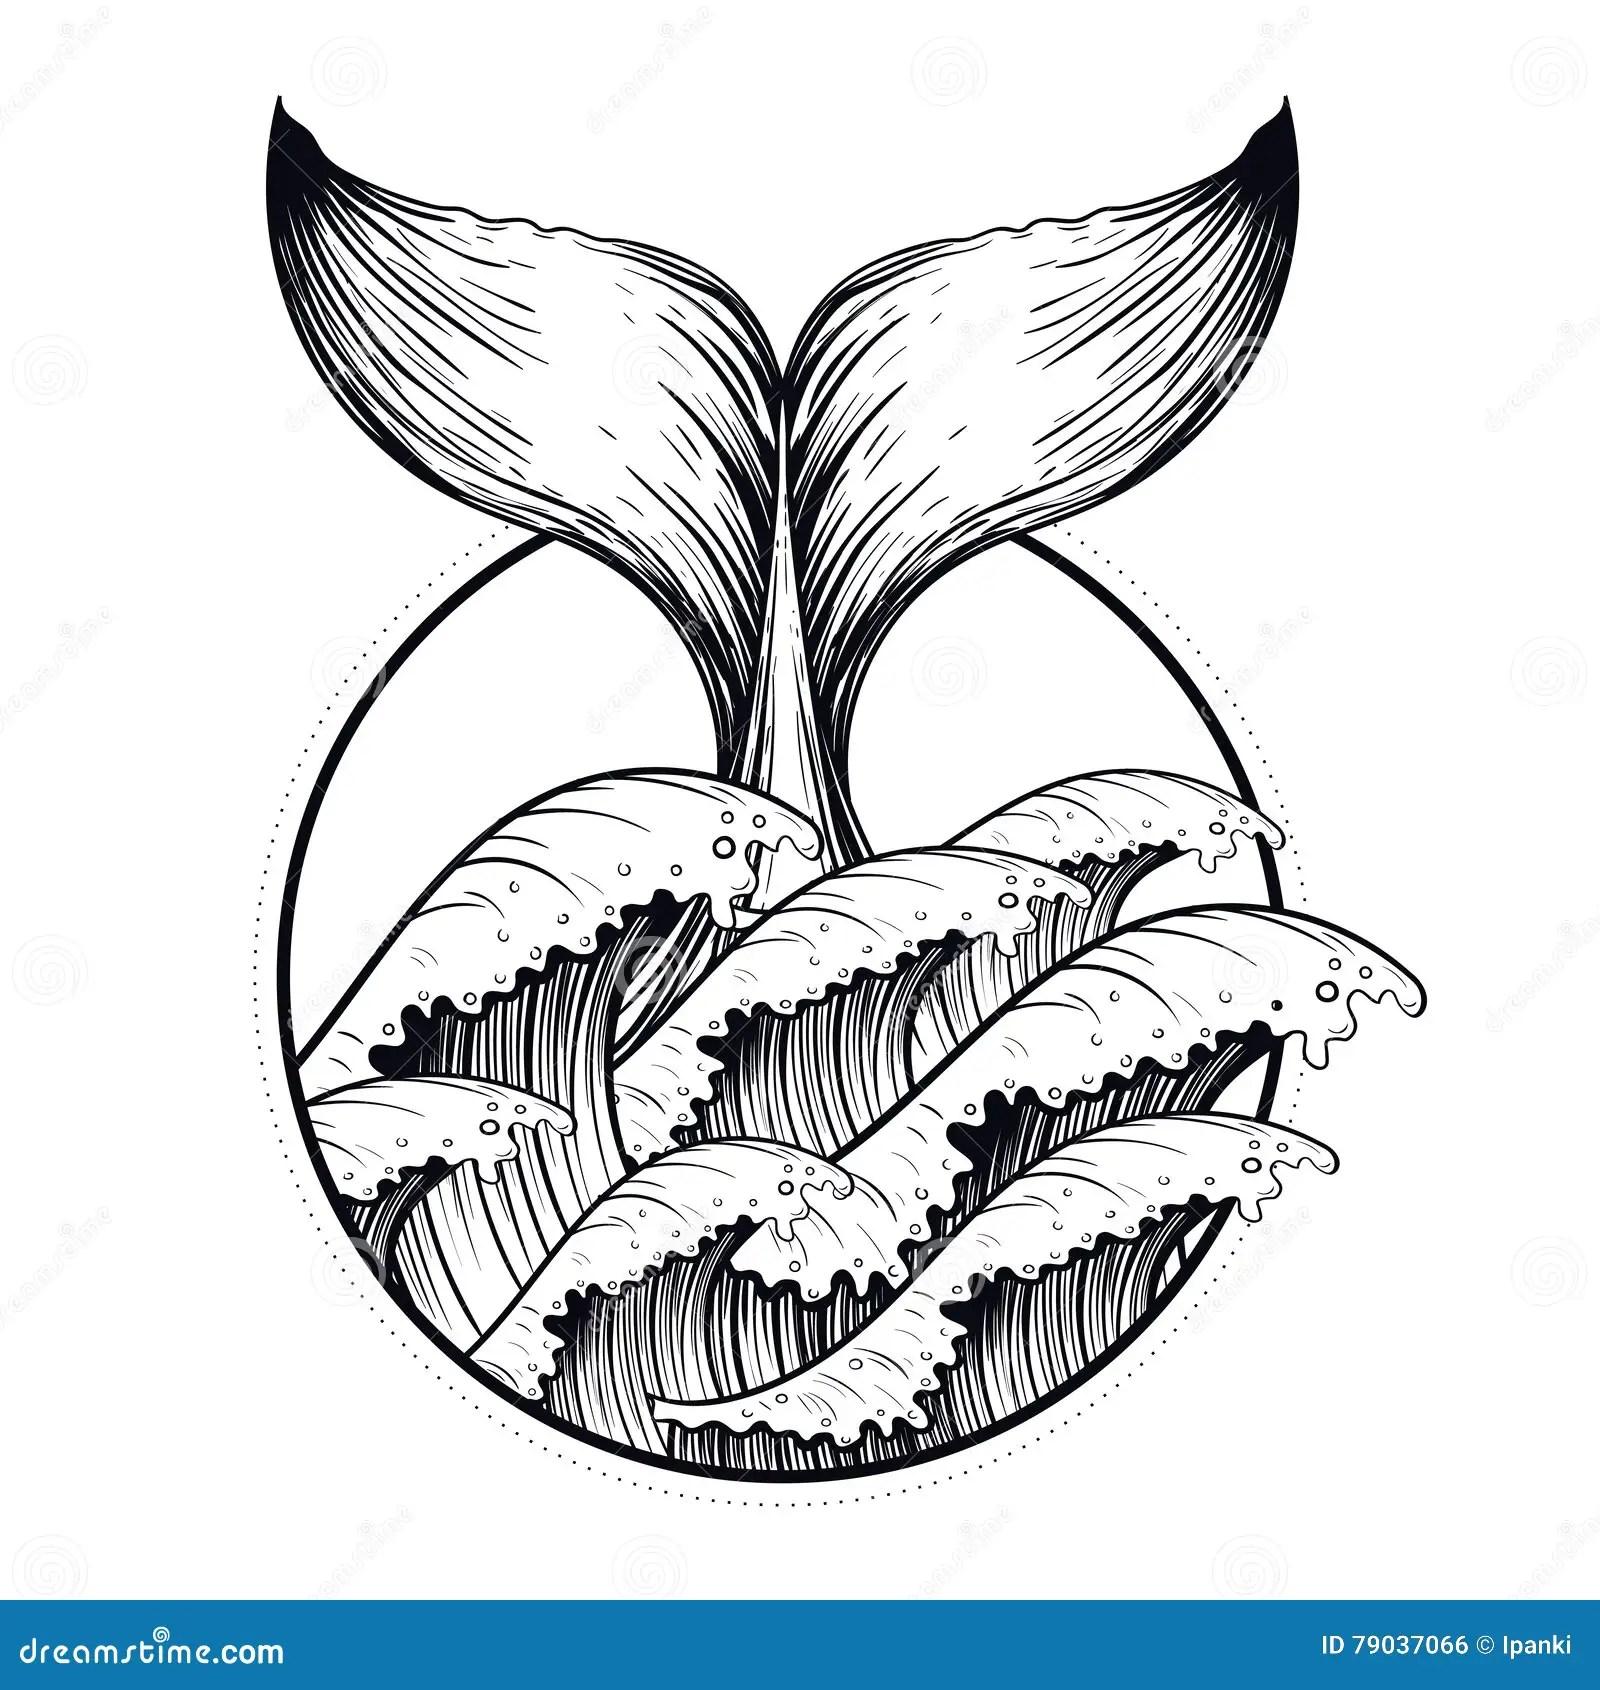 Whale Tail In Sea Waves, Boho Blackwork Tattoo. Ocean Line